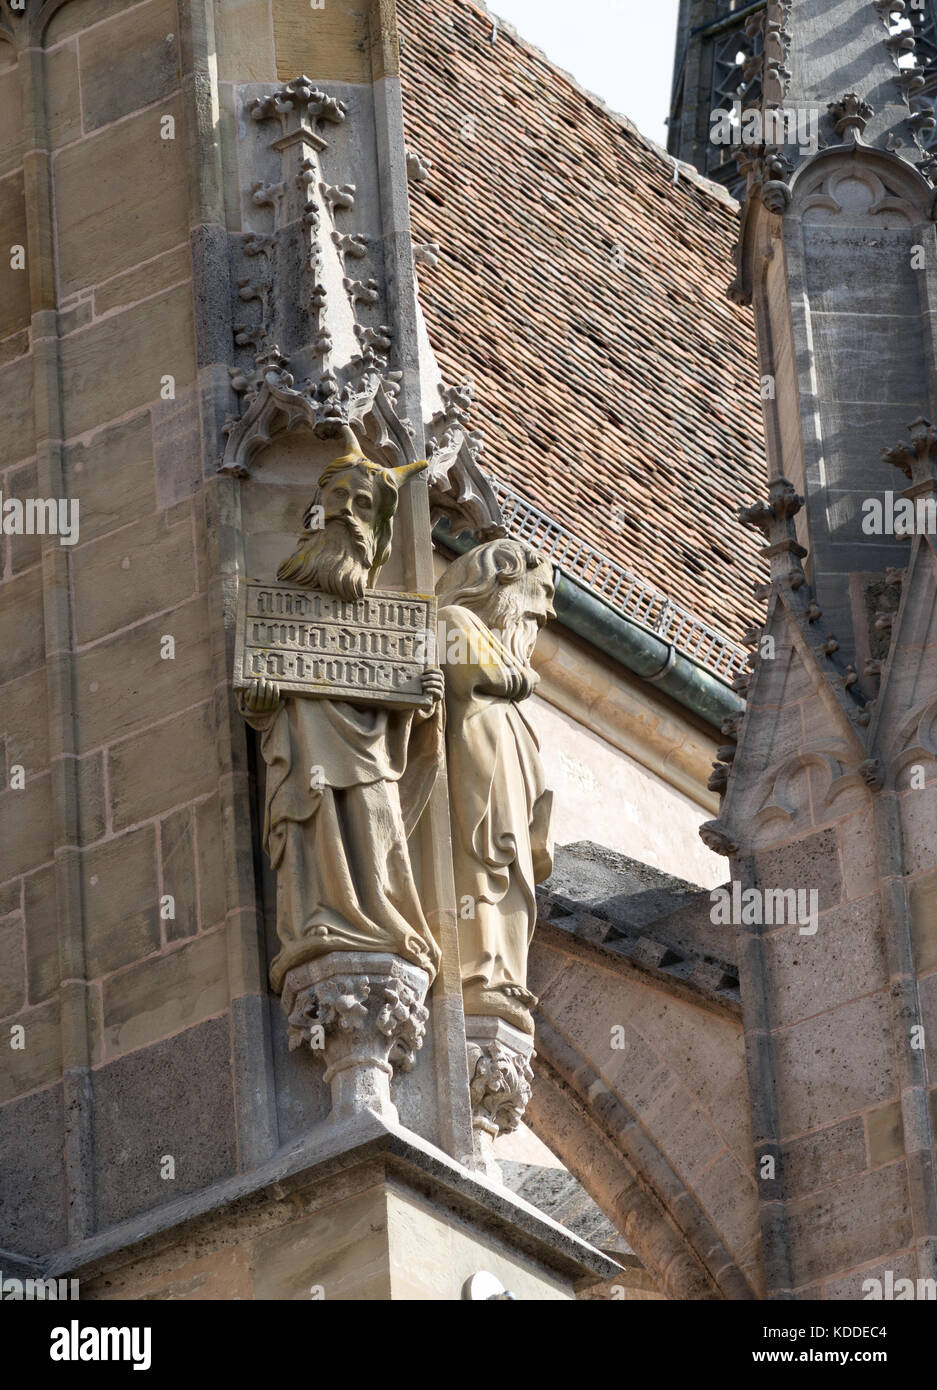 Religious statuary, Kirche St. Jakob, Rothenburg ob der Tauber, Bavaria, Germany, Europe - Stock Image